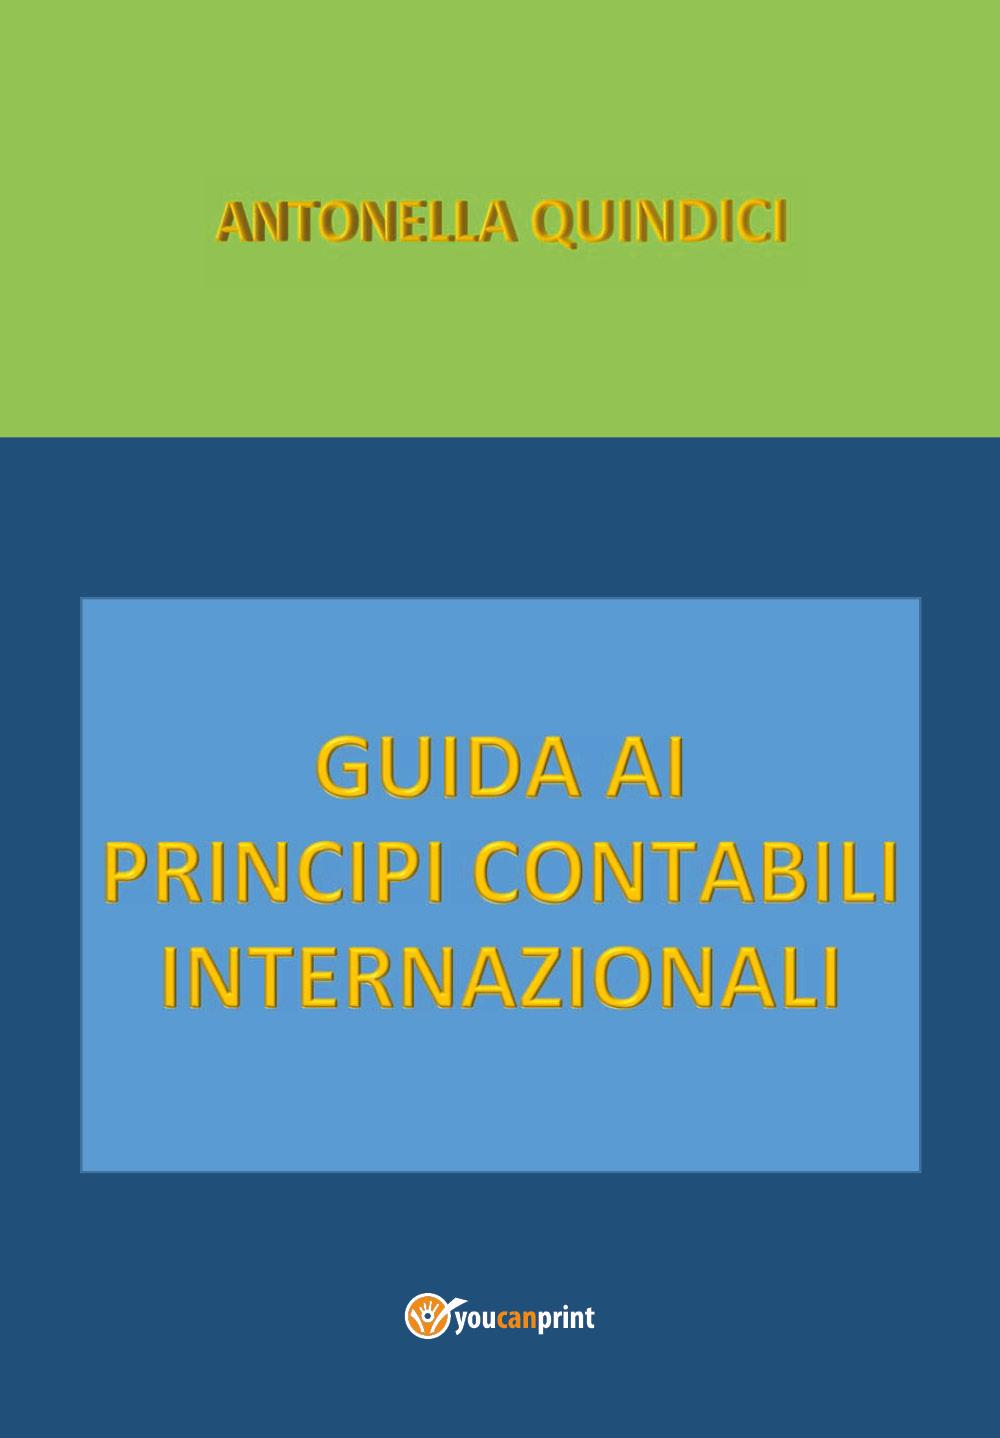 Guida ai Principi Contabili Internazionali